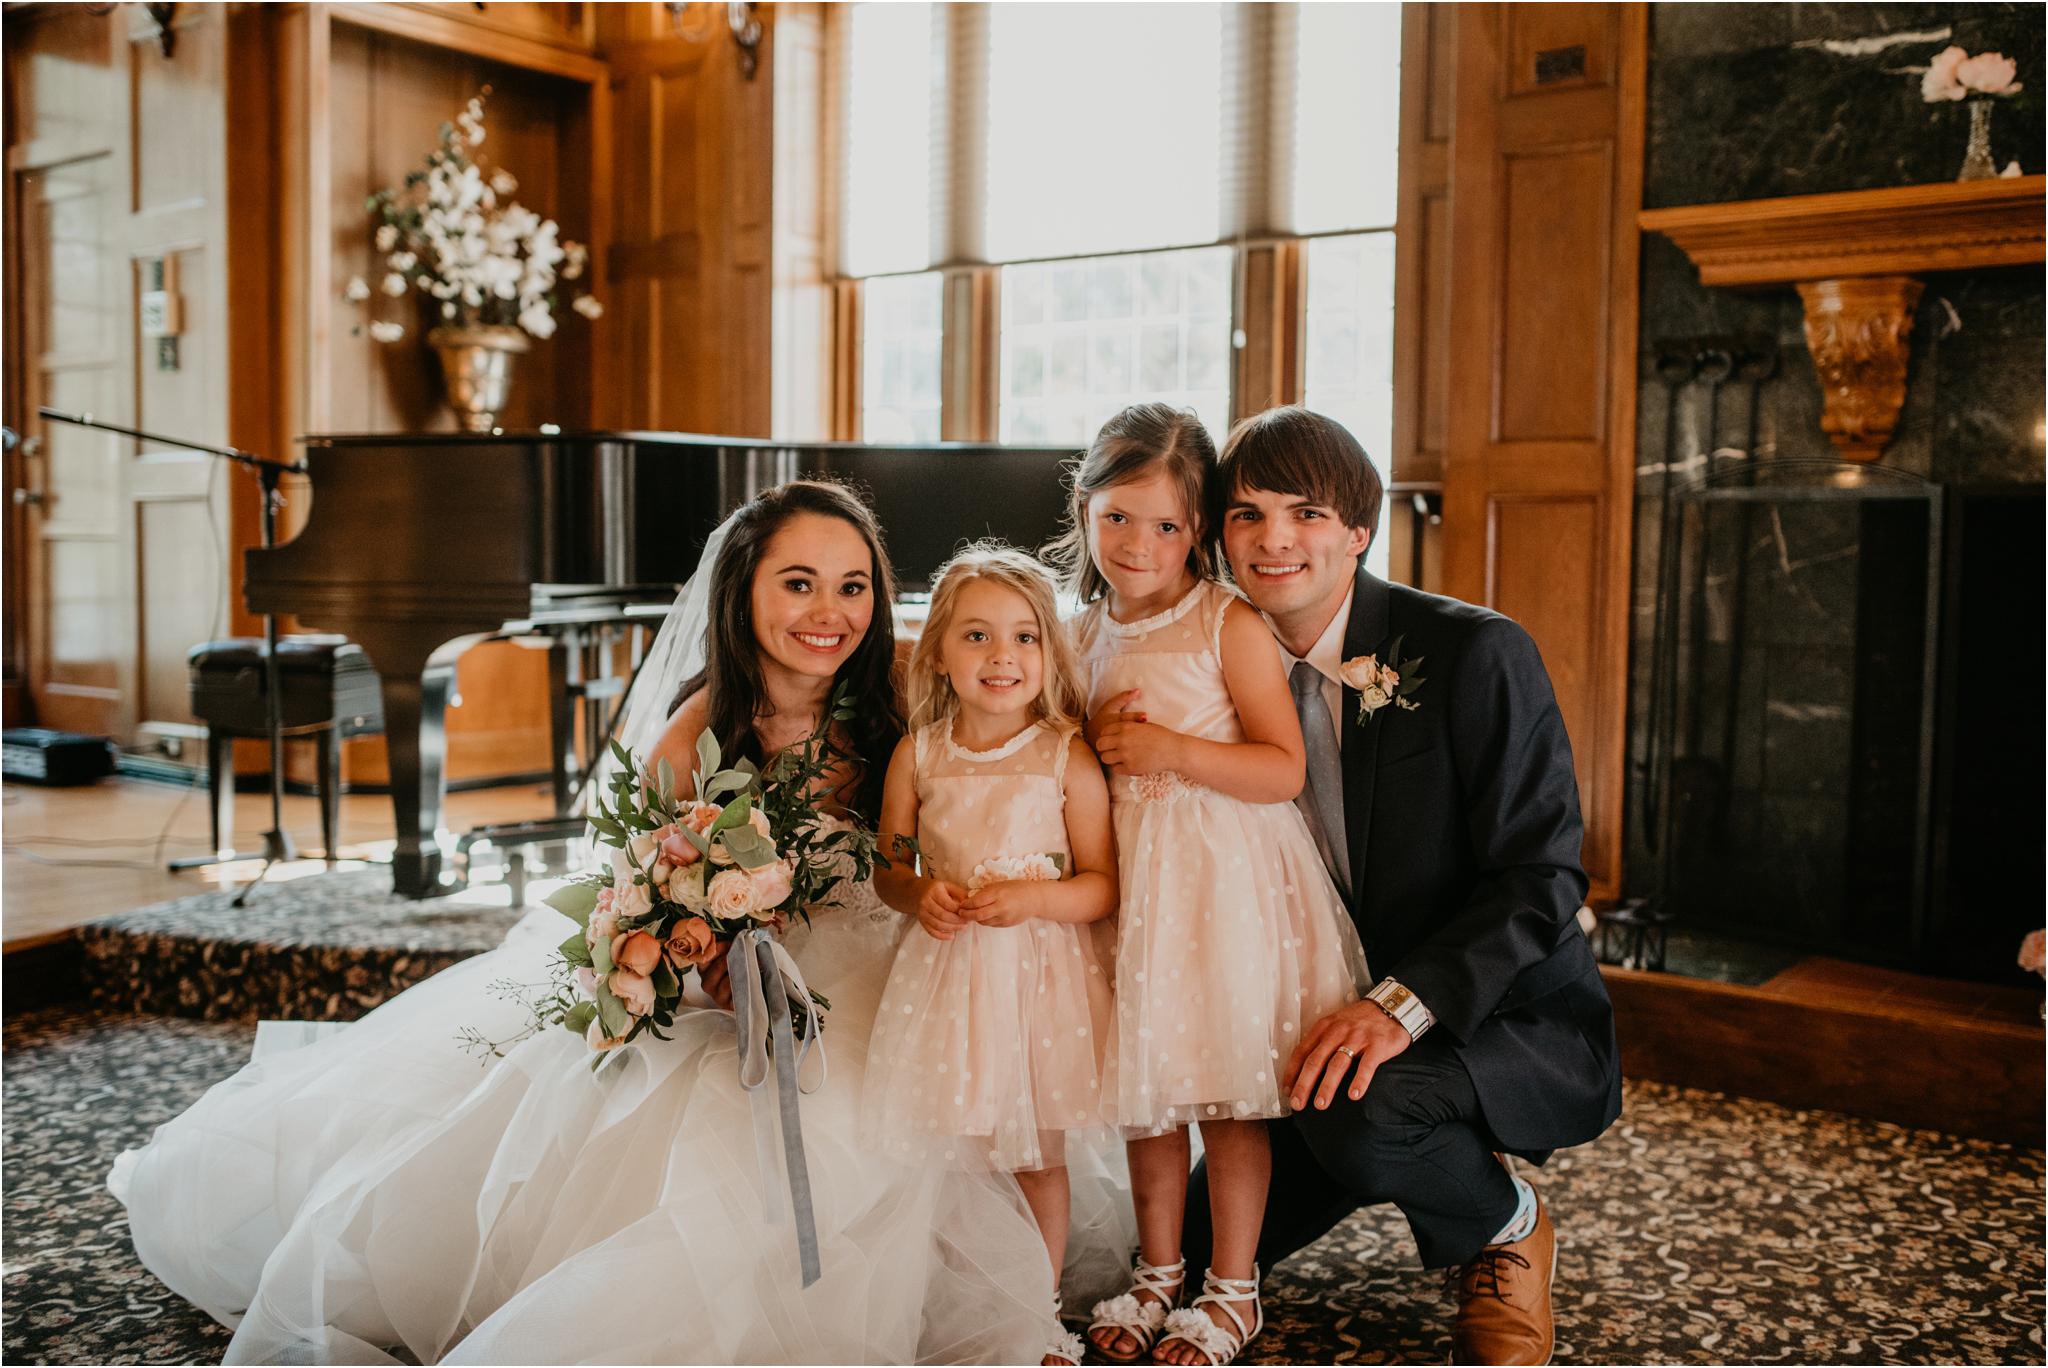 chance-and-ondrea-lairmont-manor-wedding-seattle-photographer-090.jpg